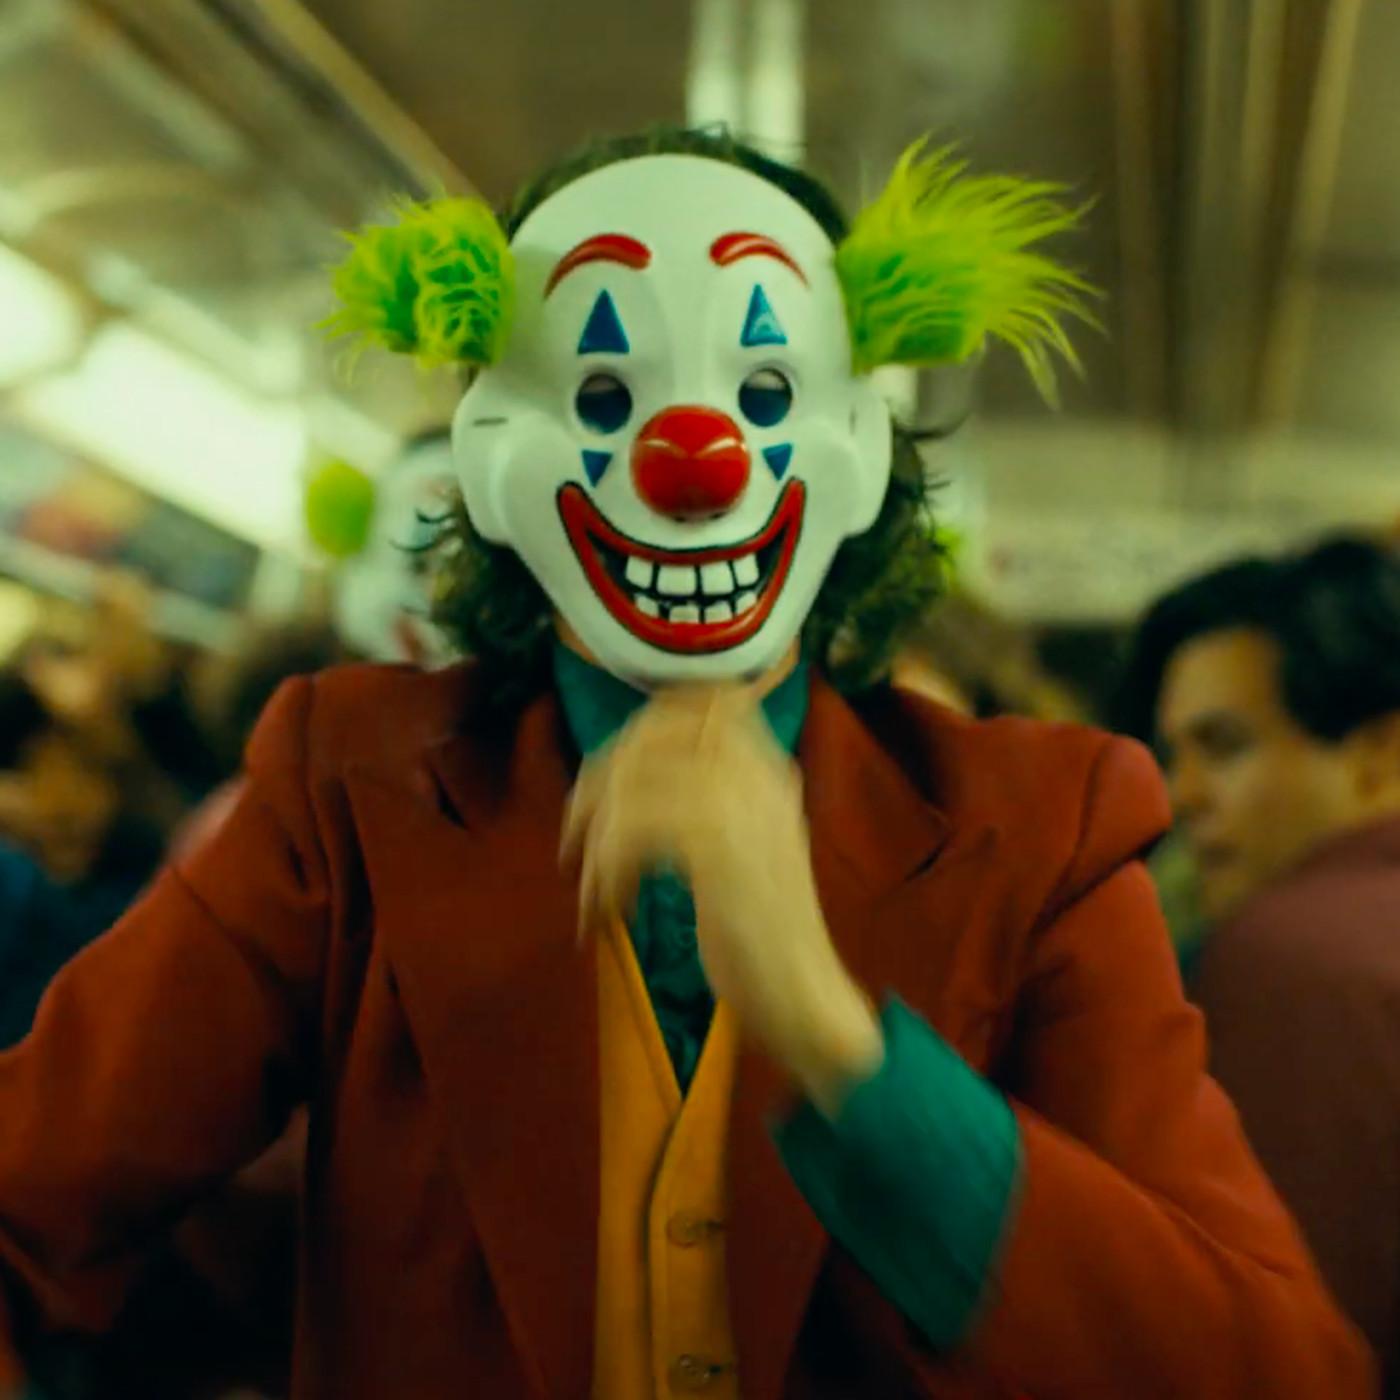 Screen Shot 2019 08 28 at 12.06.58 PM.png The 20 Biggest Ways Joker Breaks the Superhero Mold